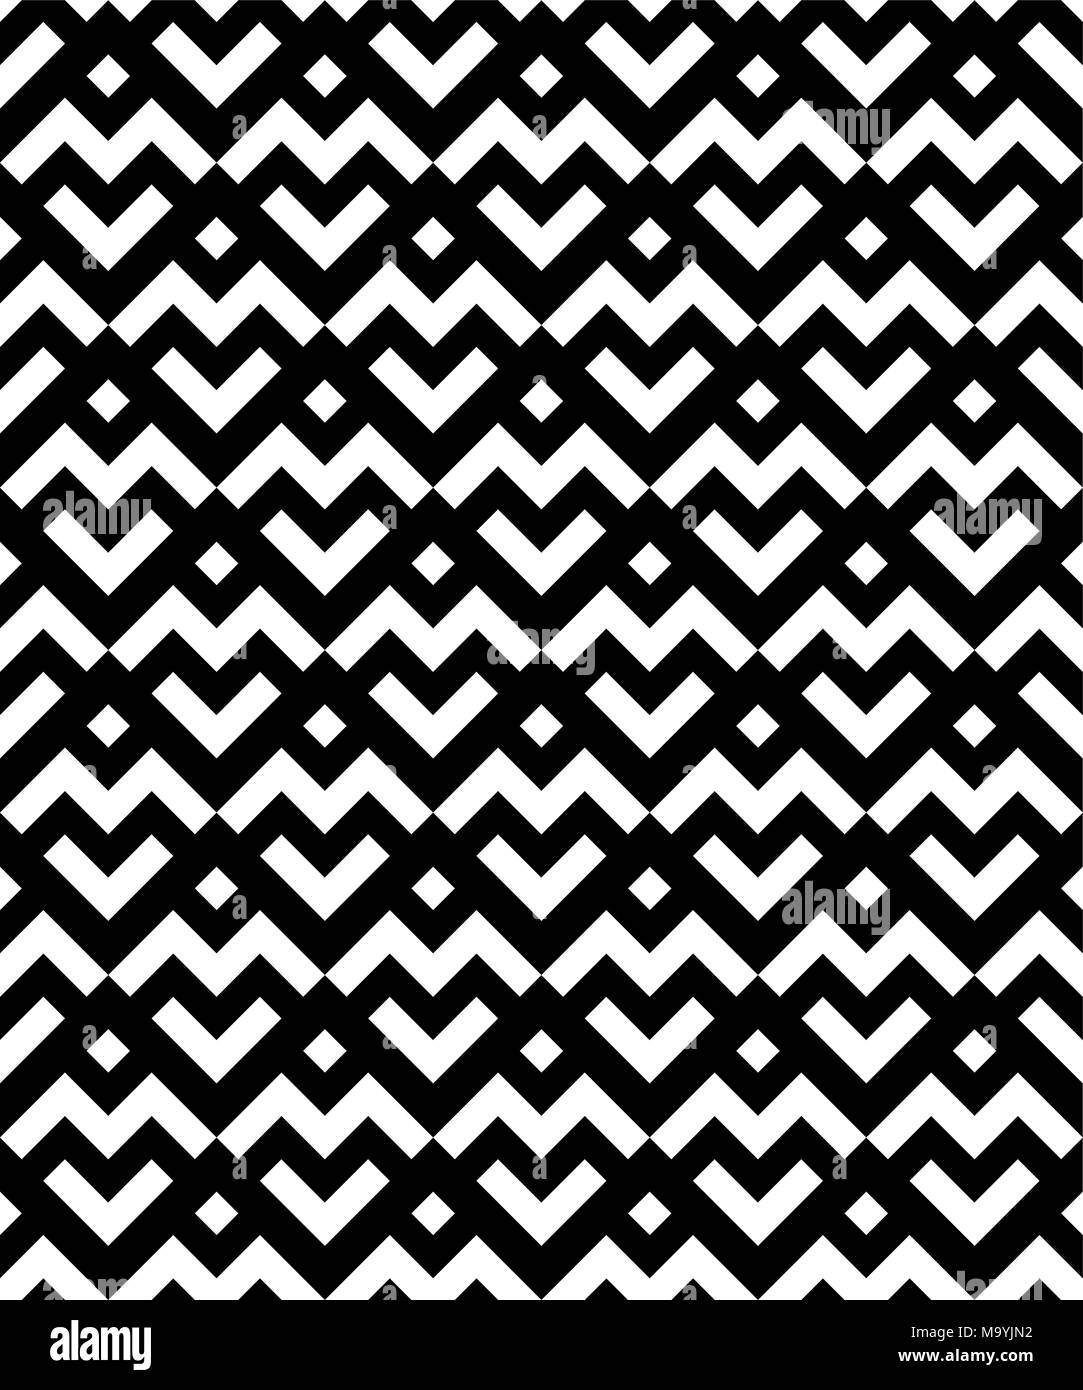 Black Zigzag Stockfotos & Black Zigzag Bilder - Alamy